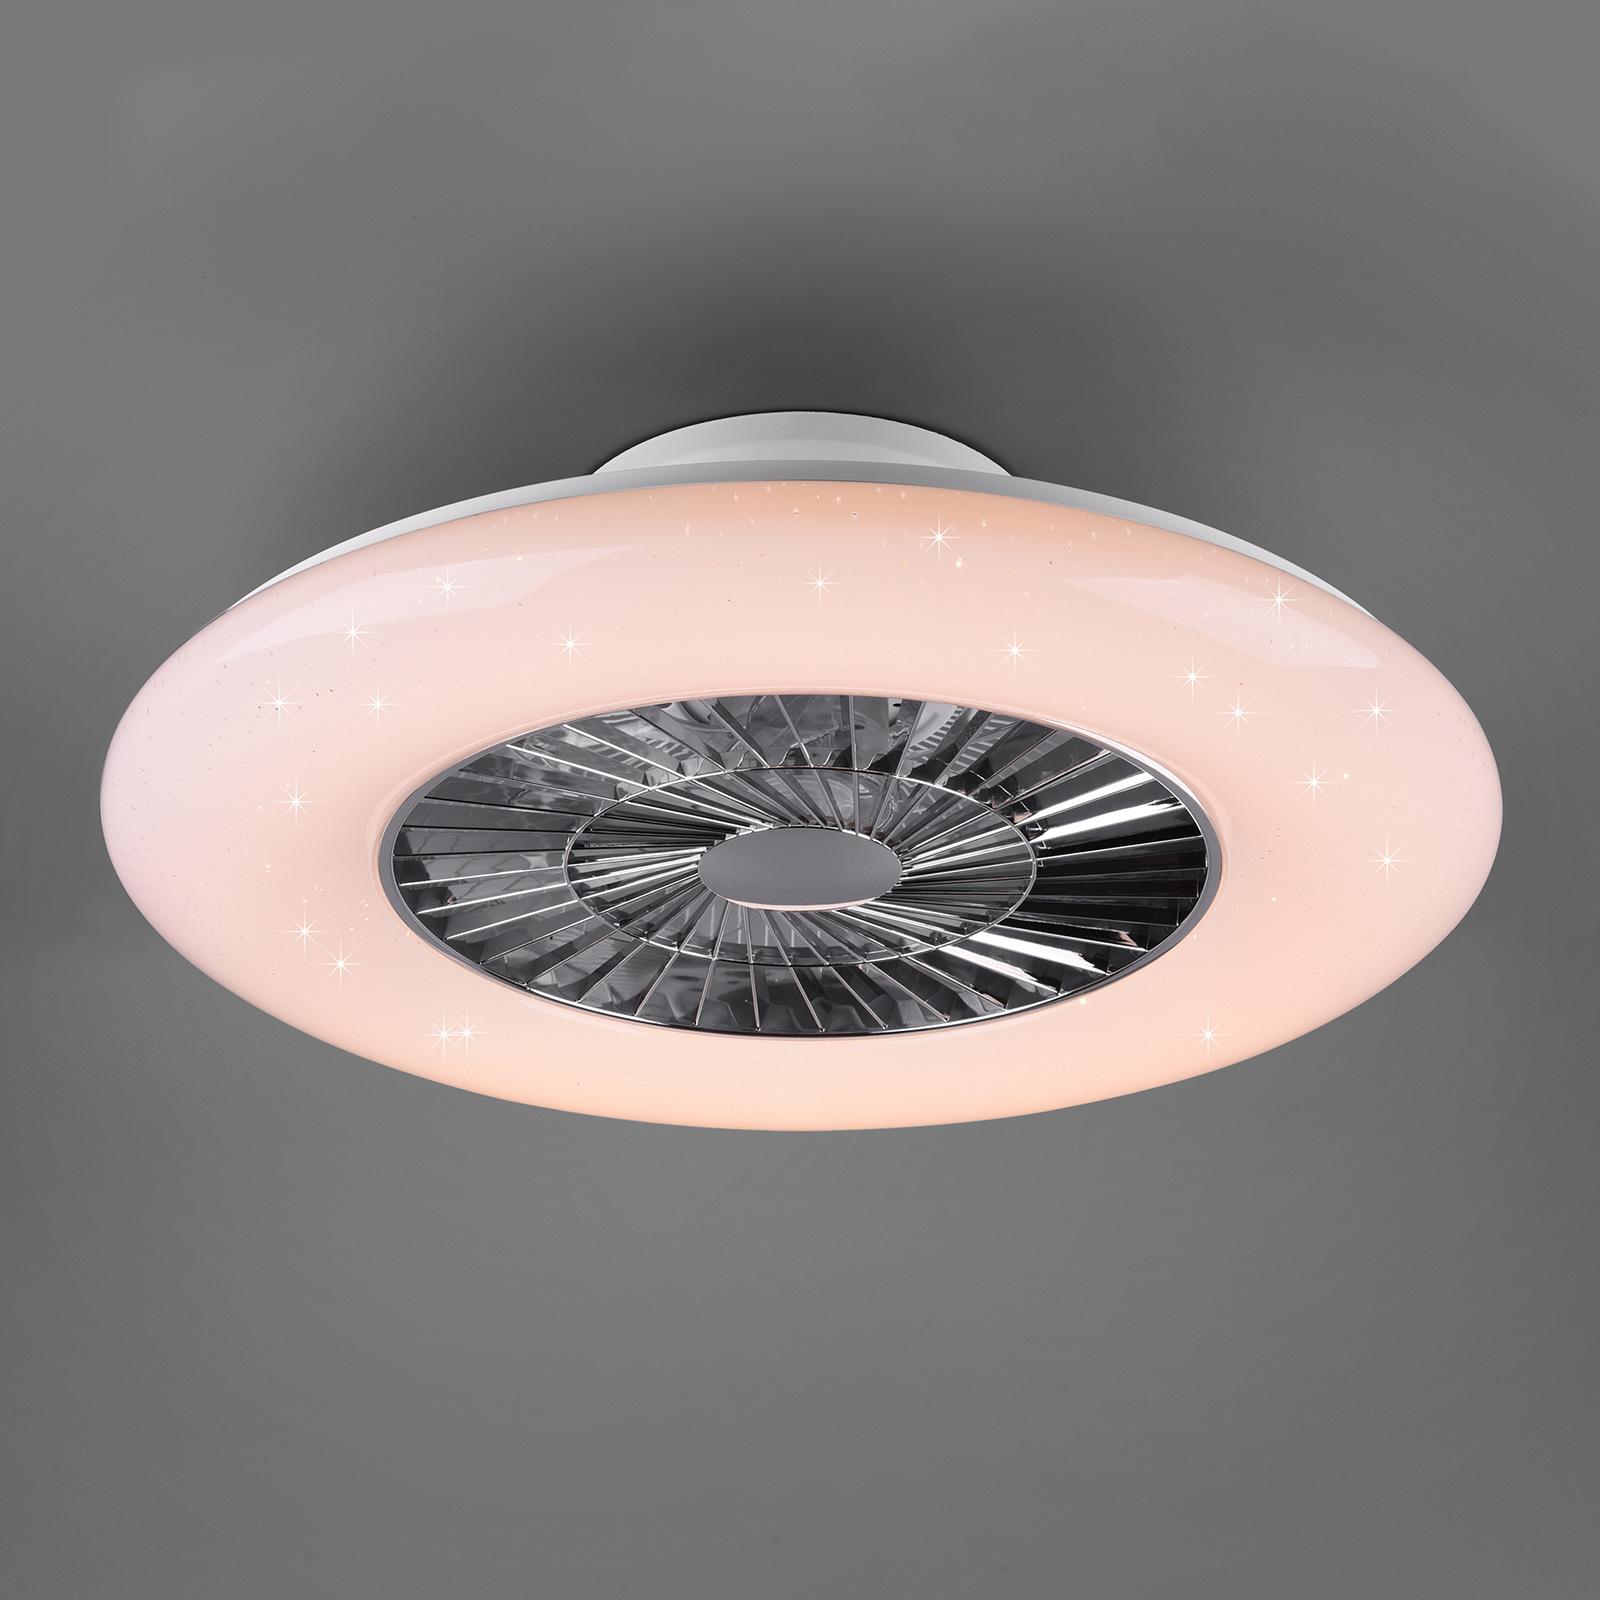 LED-kattotuuletin Visby, Ø 60cm, Tunable White